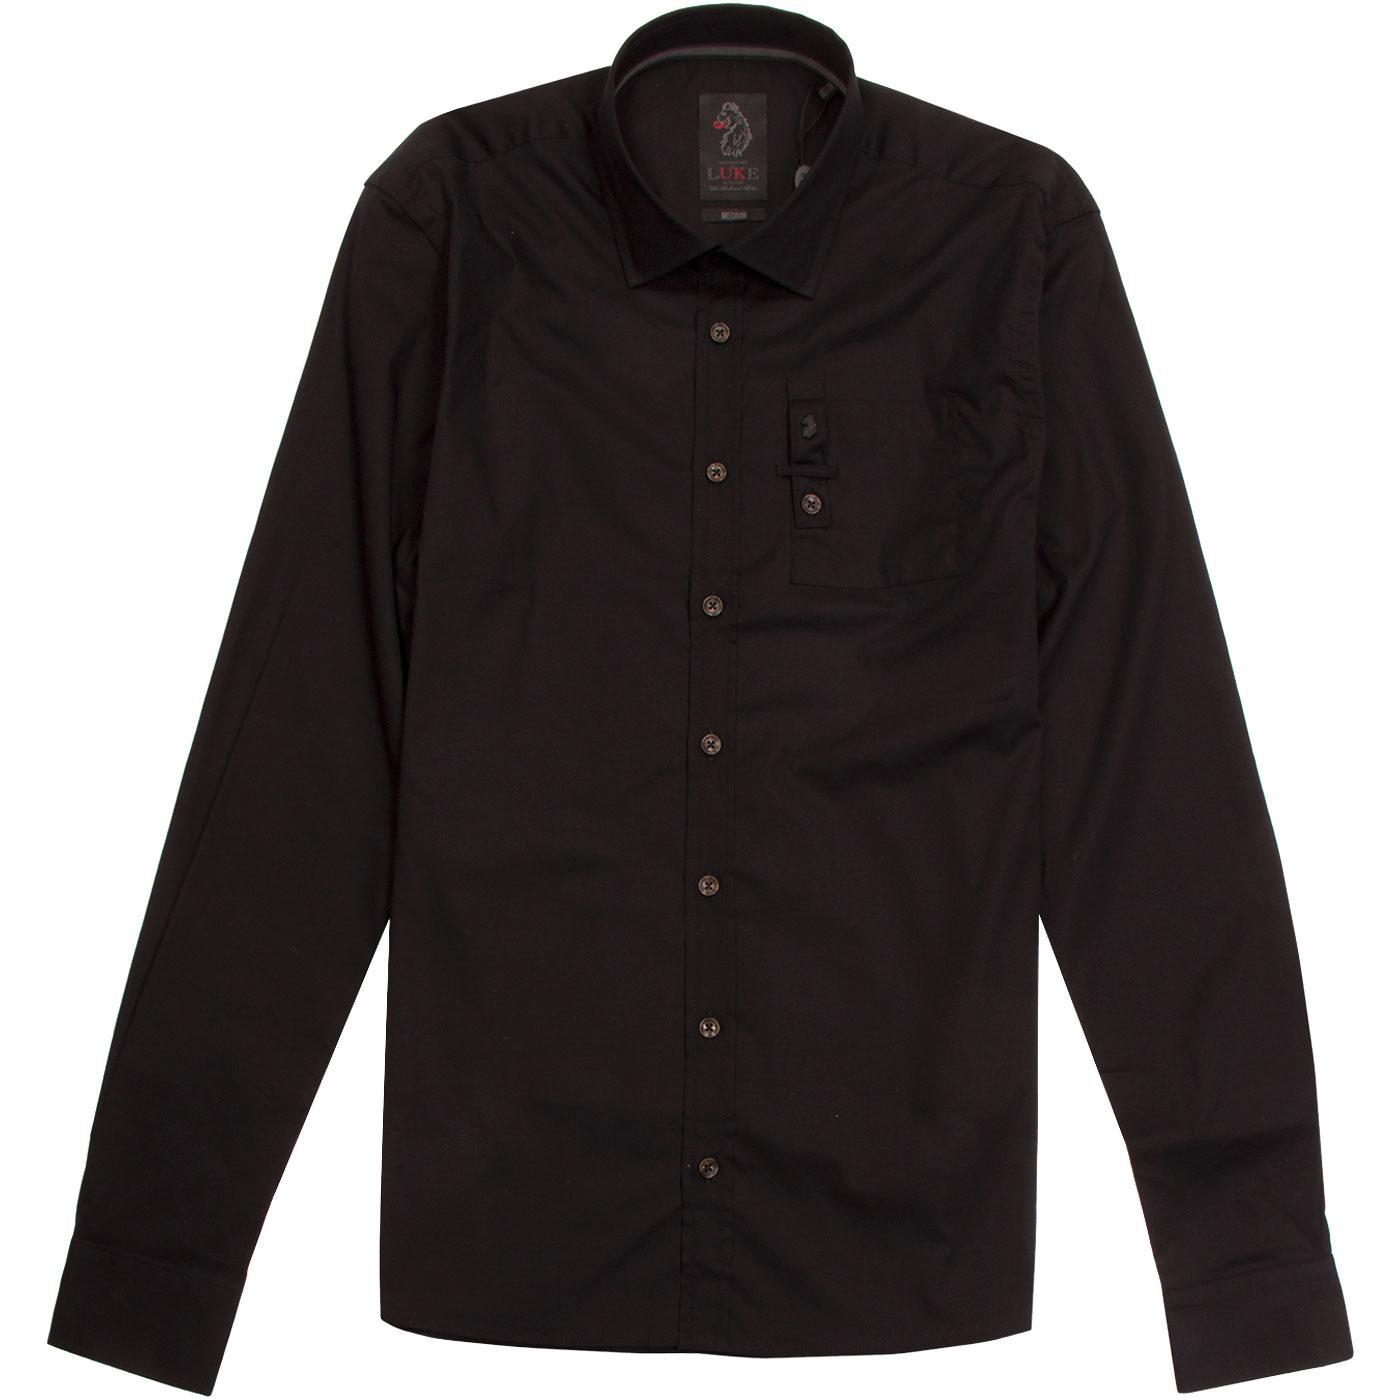 Stud Of The Wood LUKE Men's Retro Pocket Shirt B